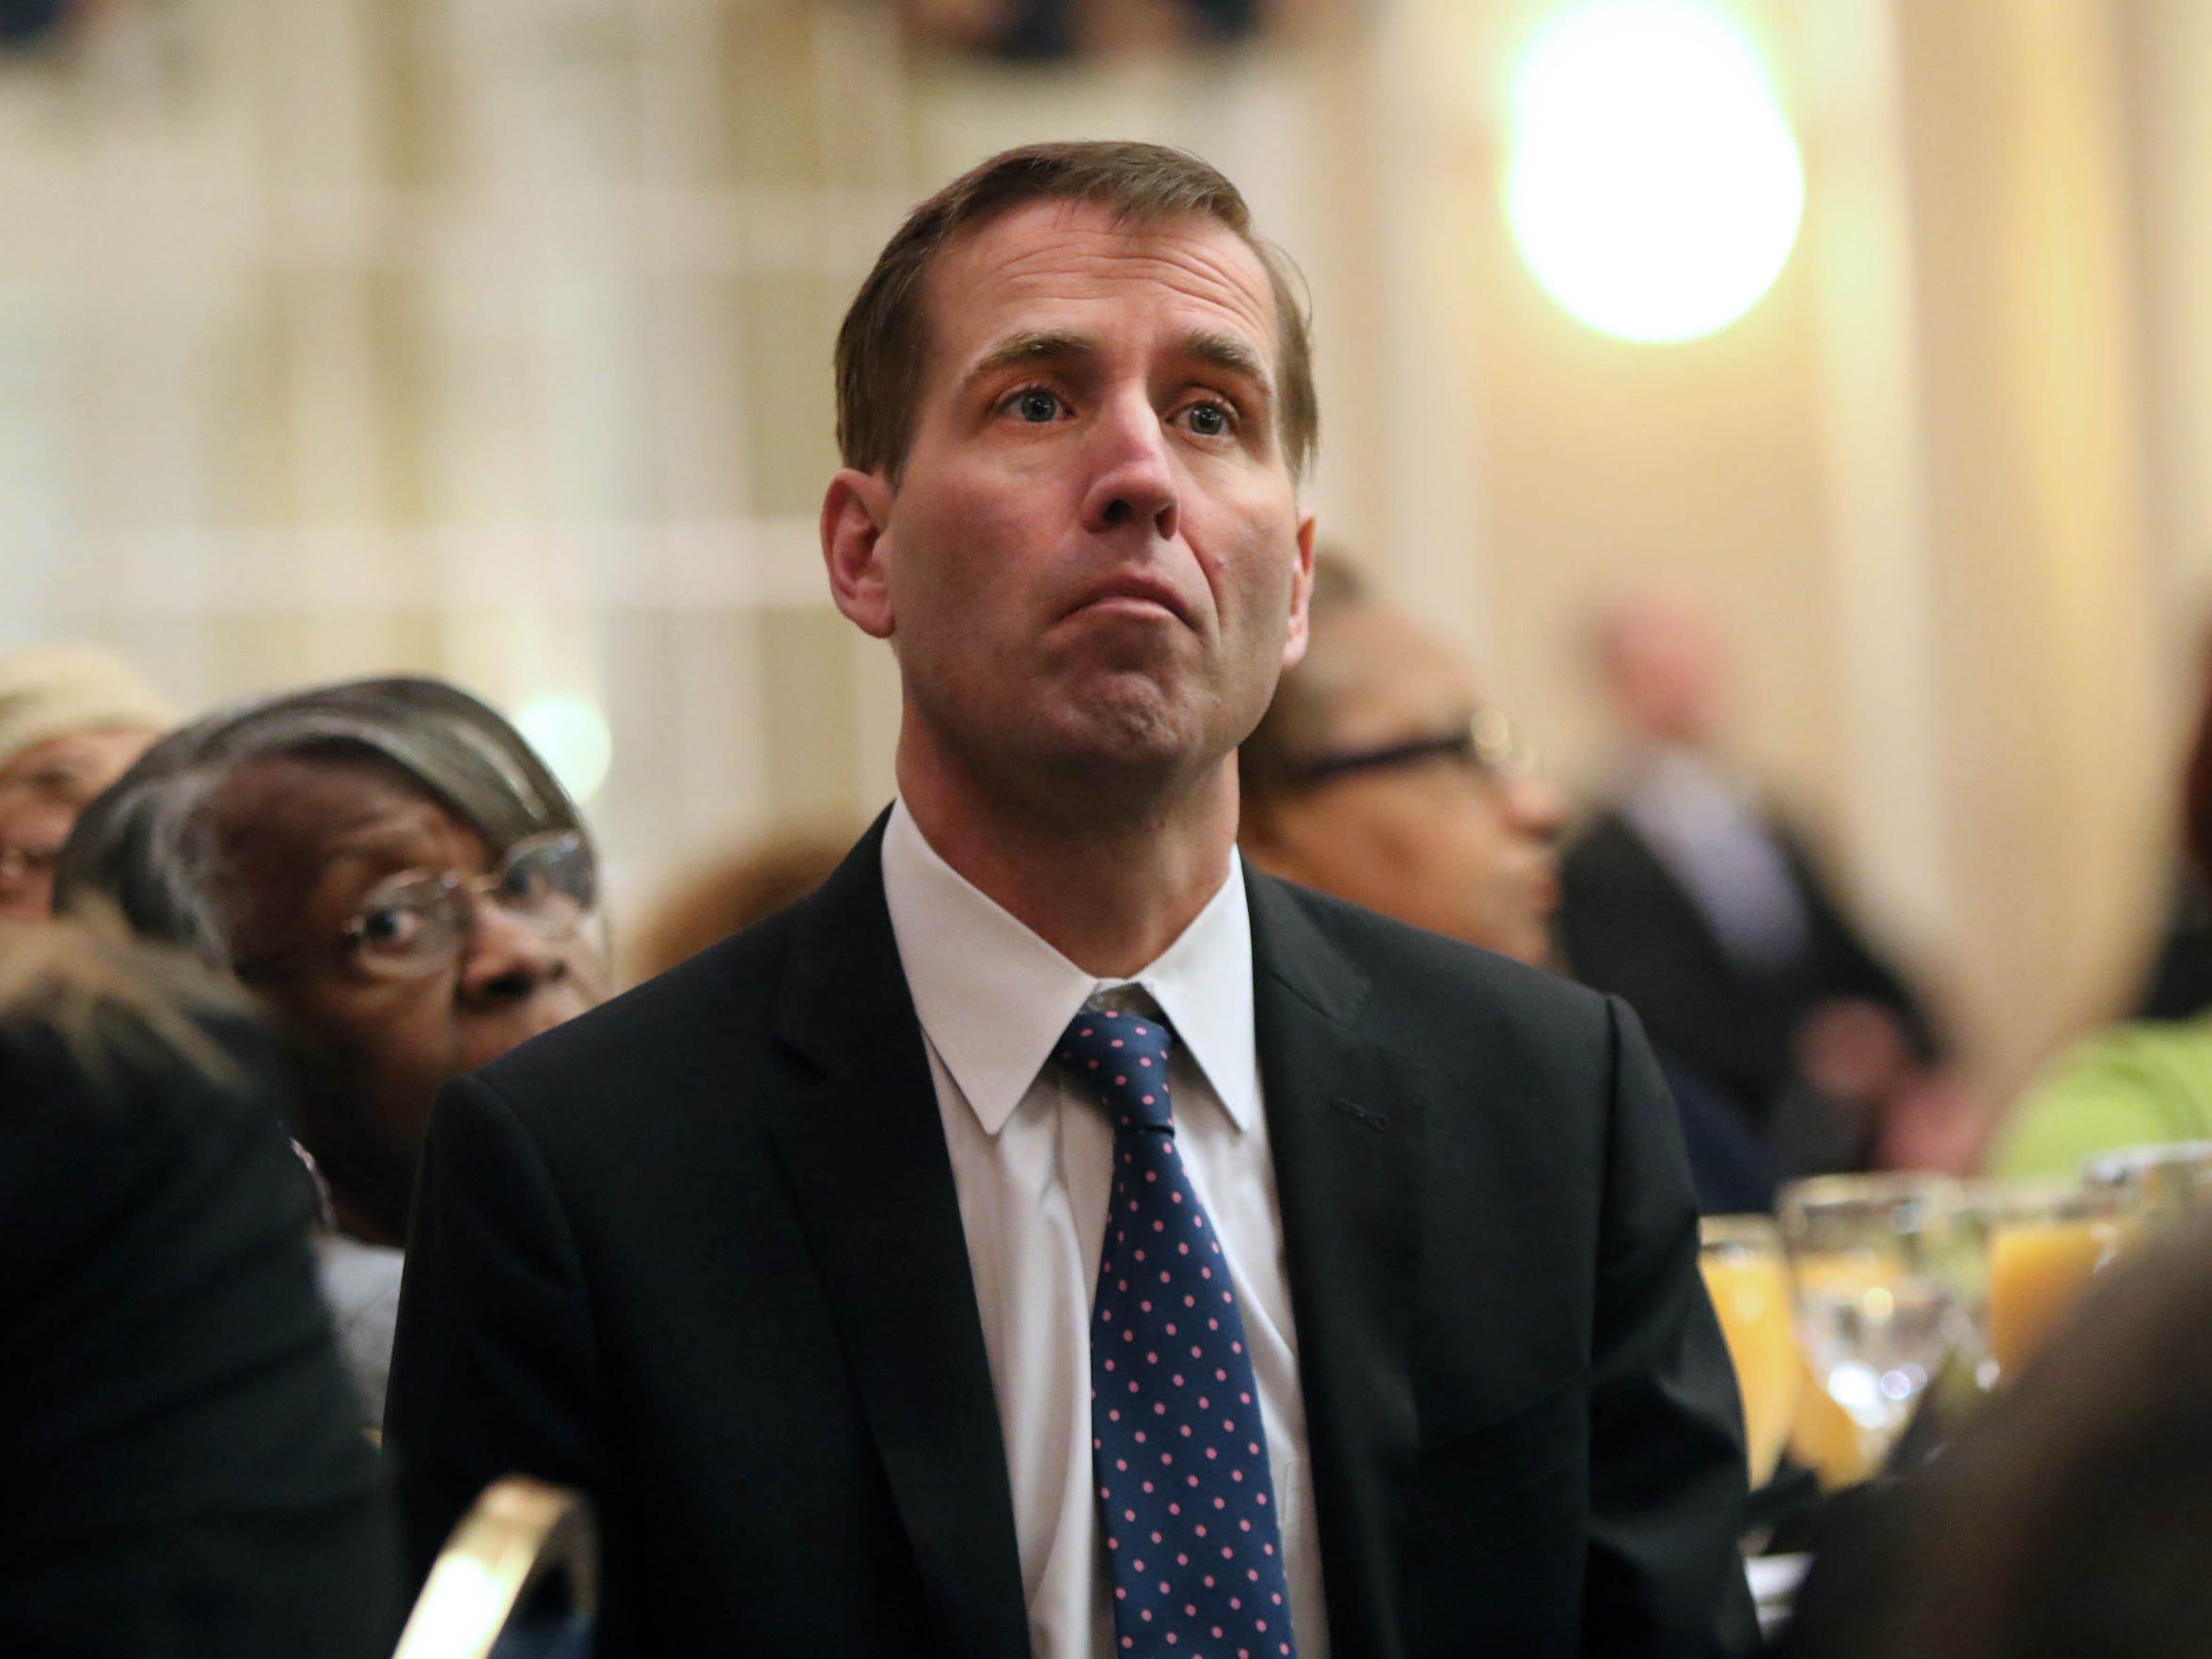 Beau Biden, eldest son of Joe Biden, dies due to complications from